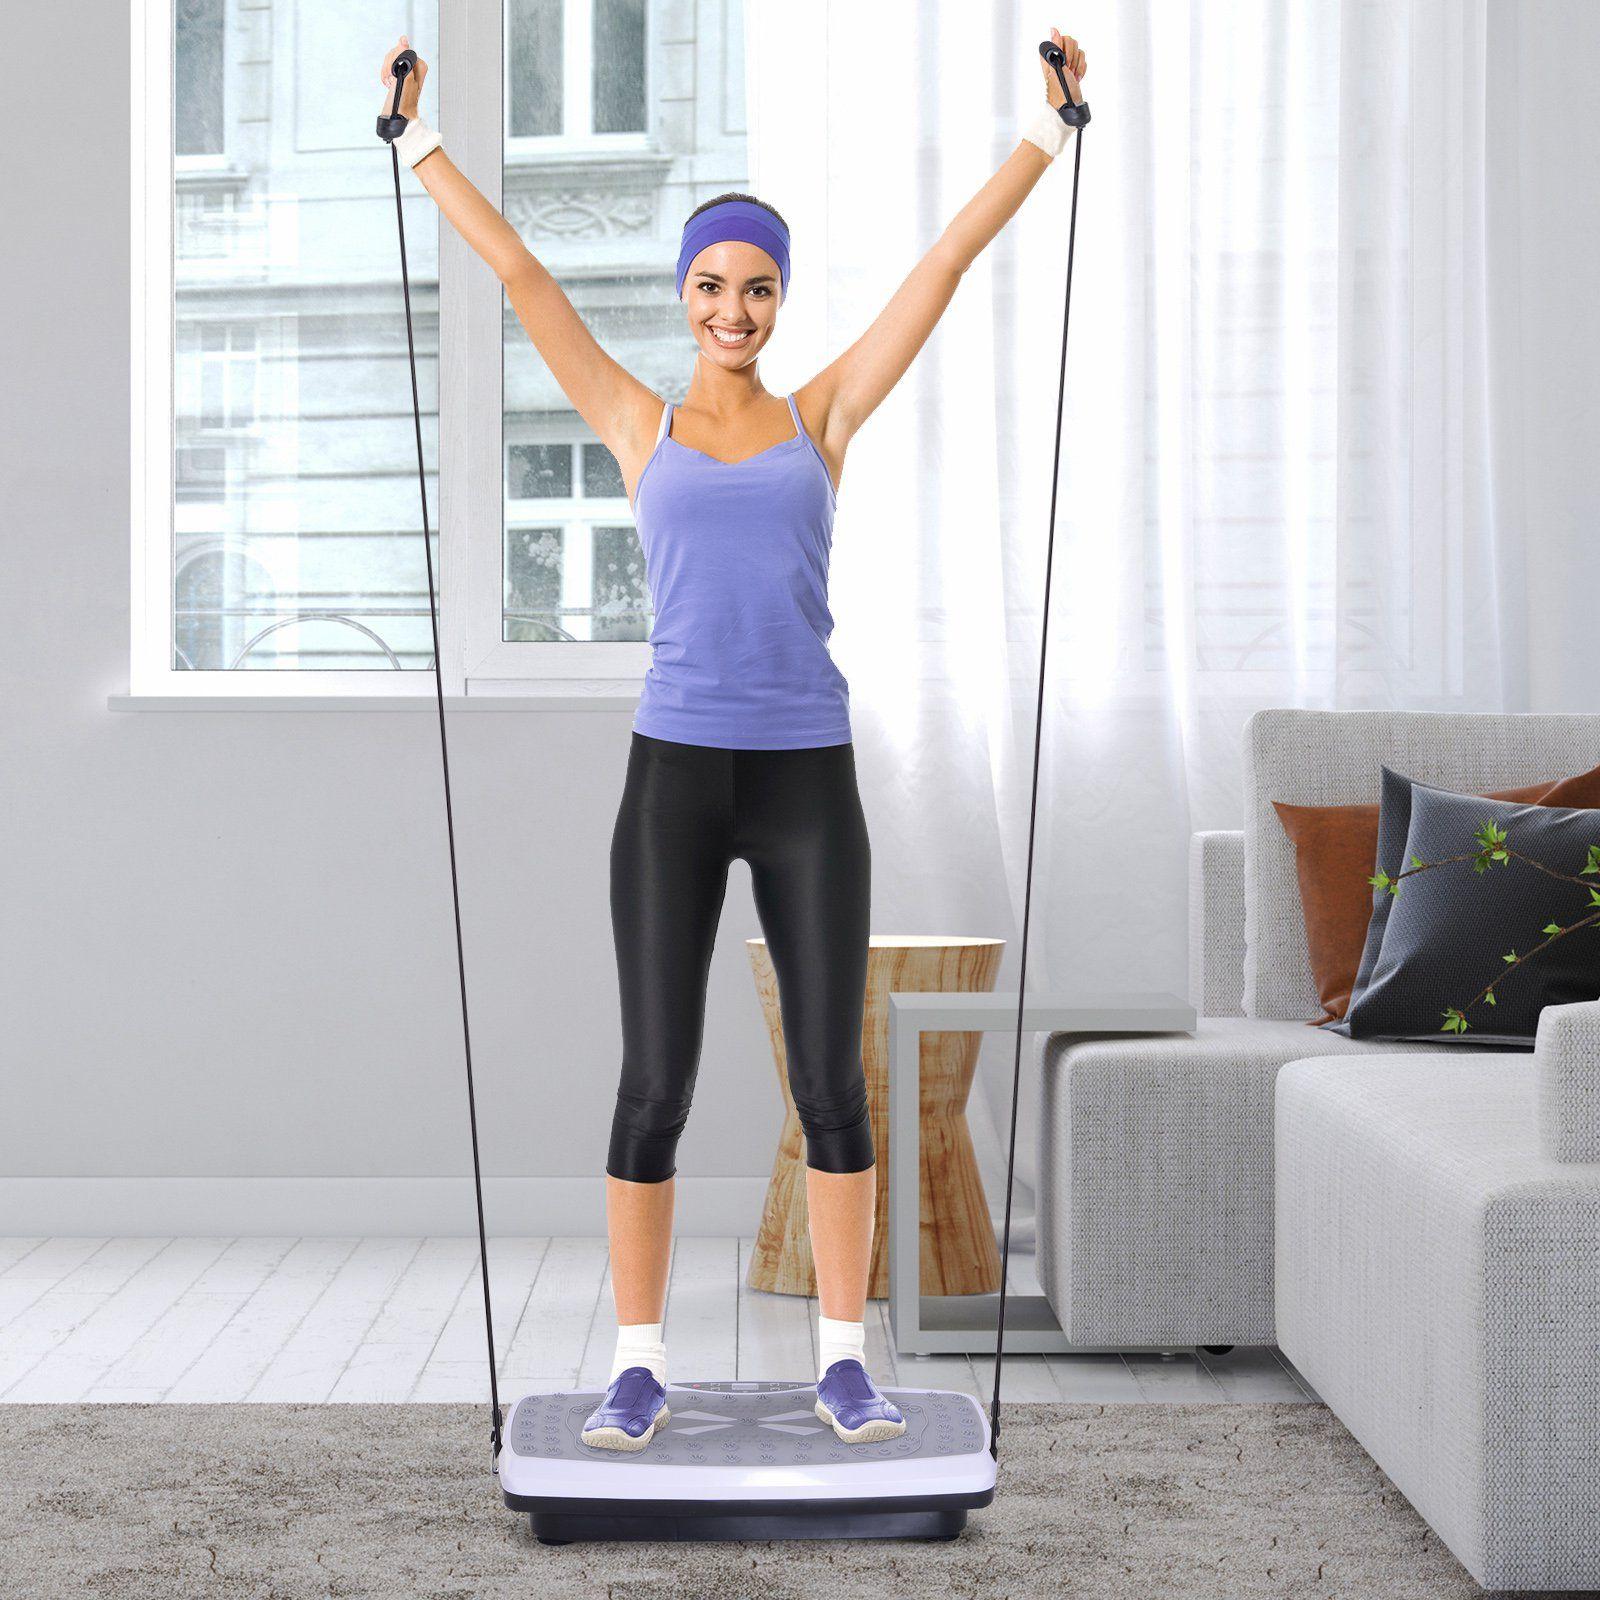 Jolitec® Plataforma Vibratoria  para Fitness Entrenamiento 2 Bandas Elásticas